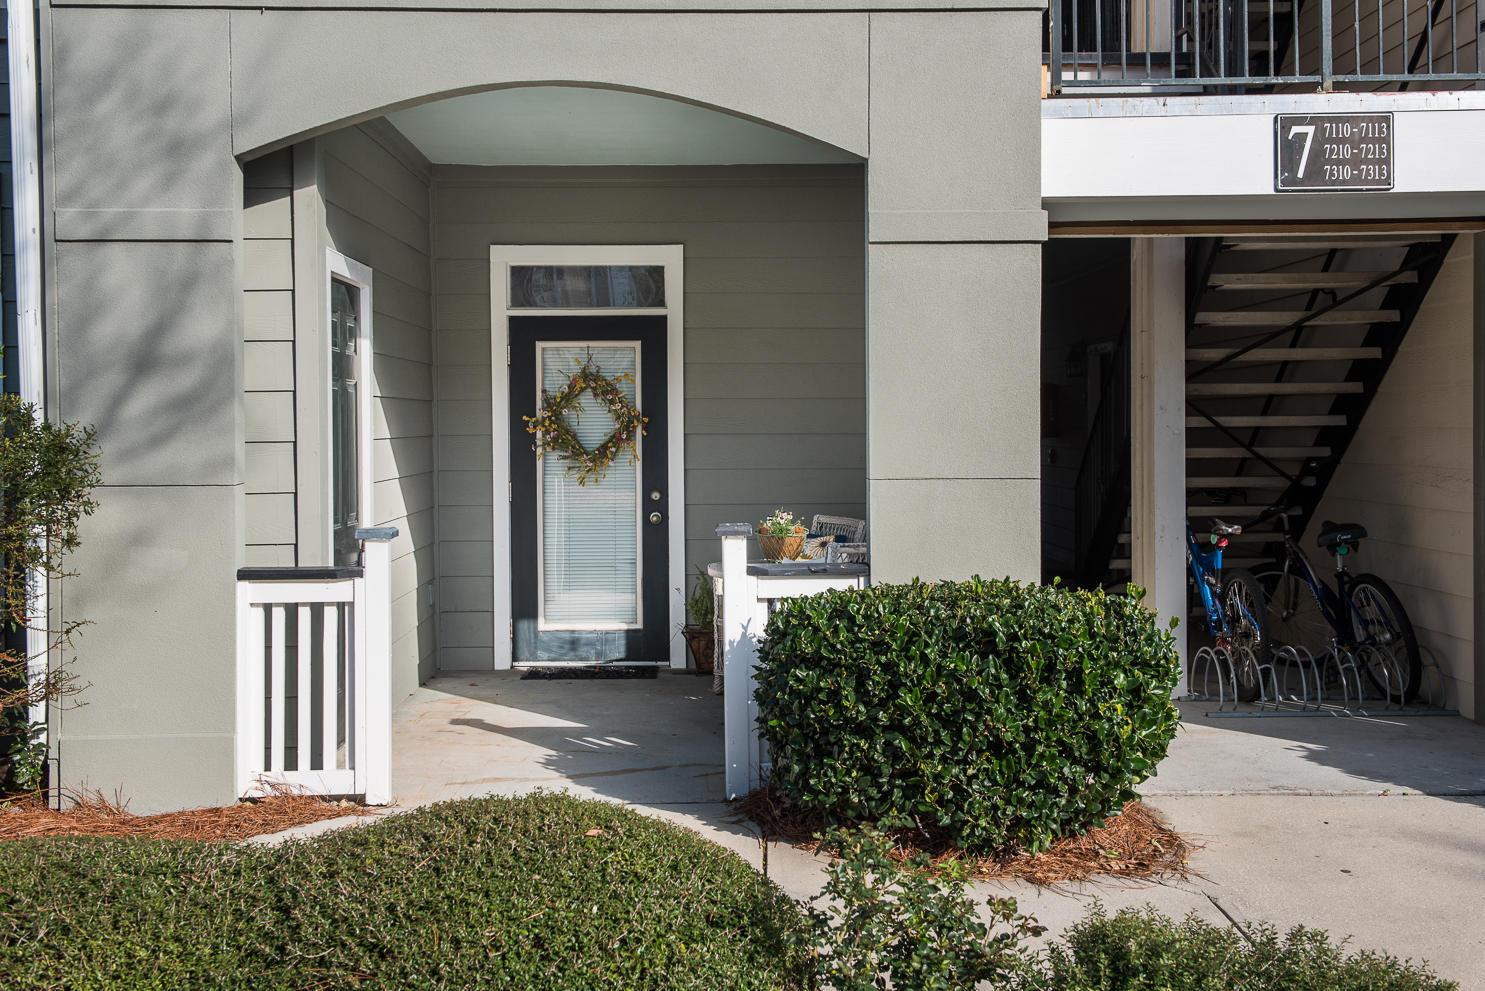 Daniel Landing Condos Homes For Sale - 130 River Landing, Charleston, SC - 33